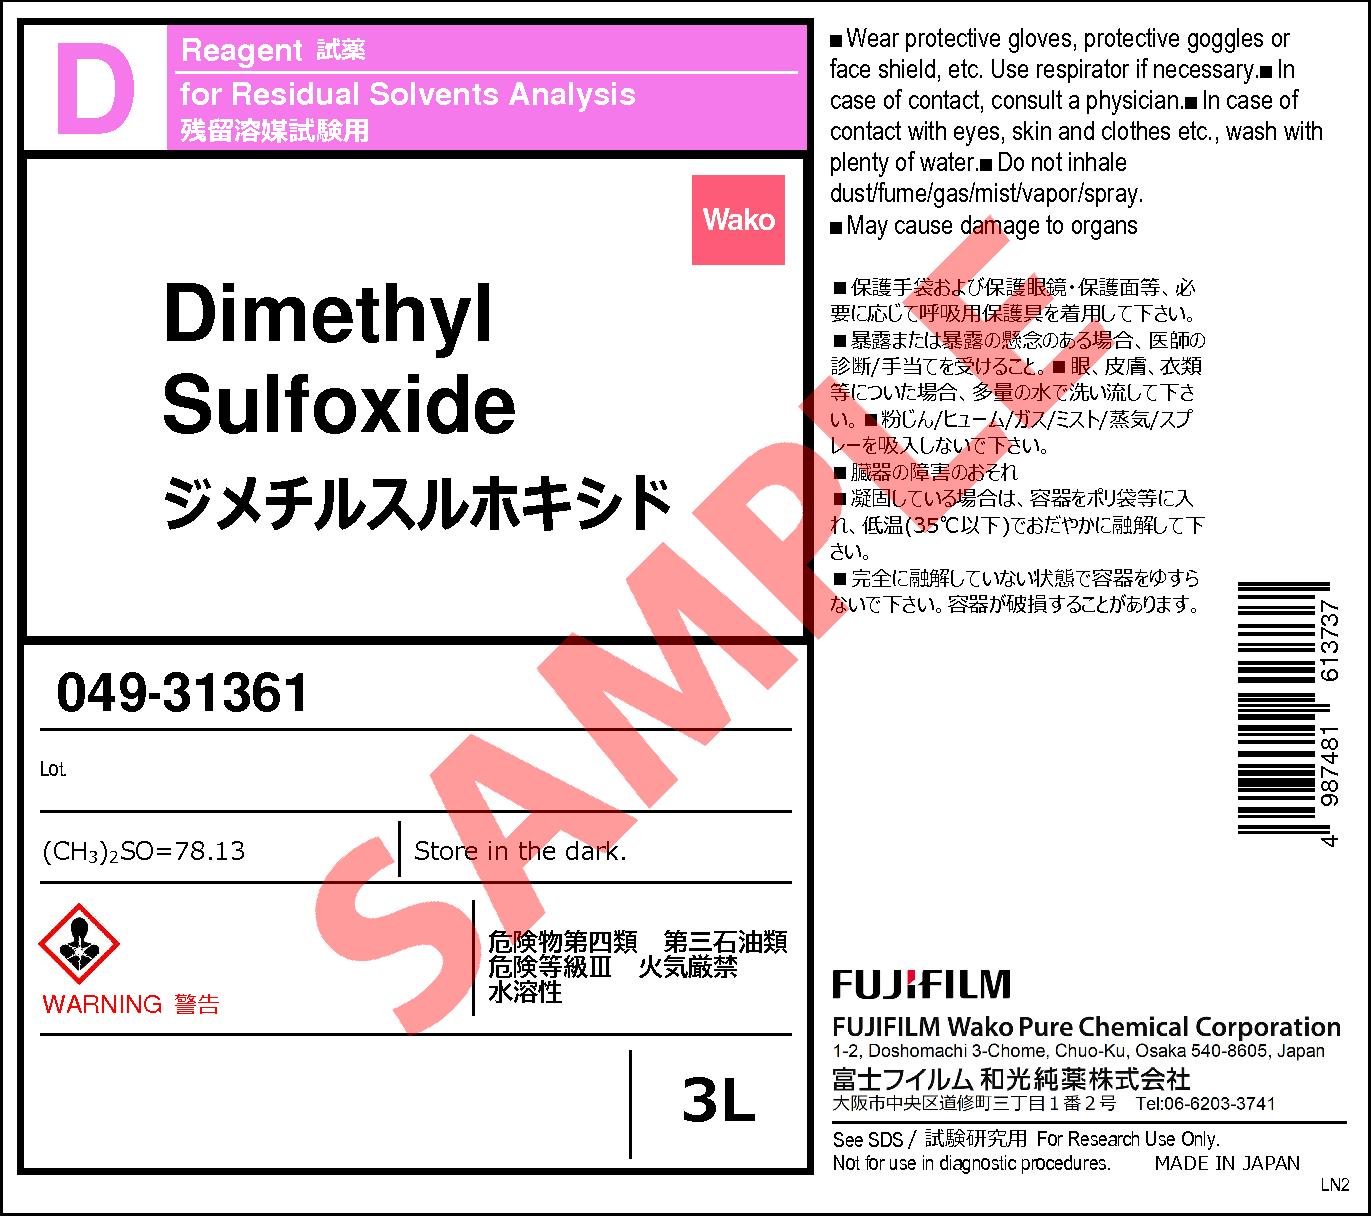 67-68-5・Dimethyl Sulfoxide・049-31361・041-31365[Detail